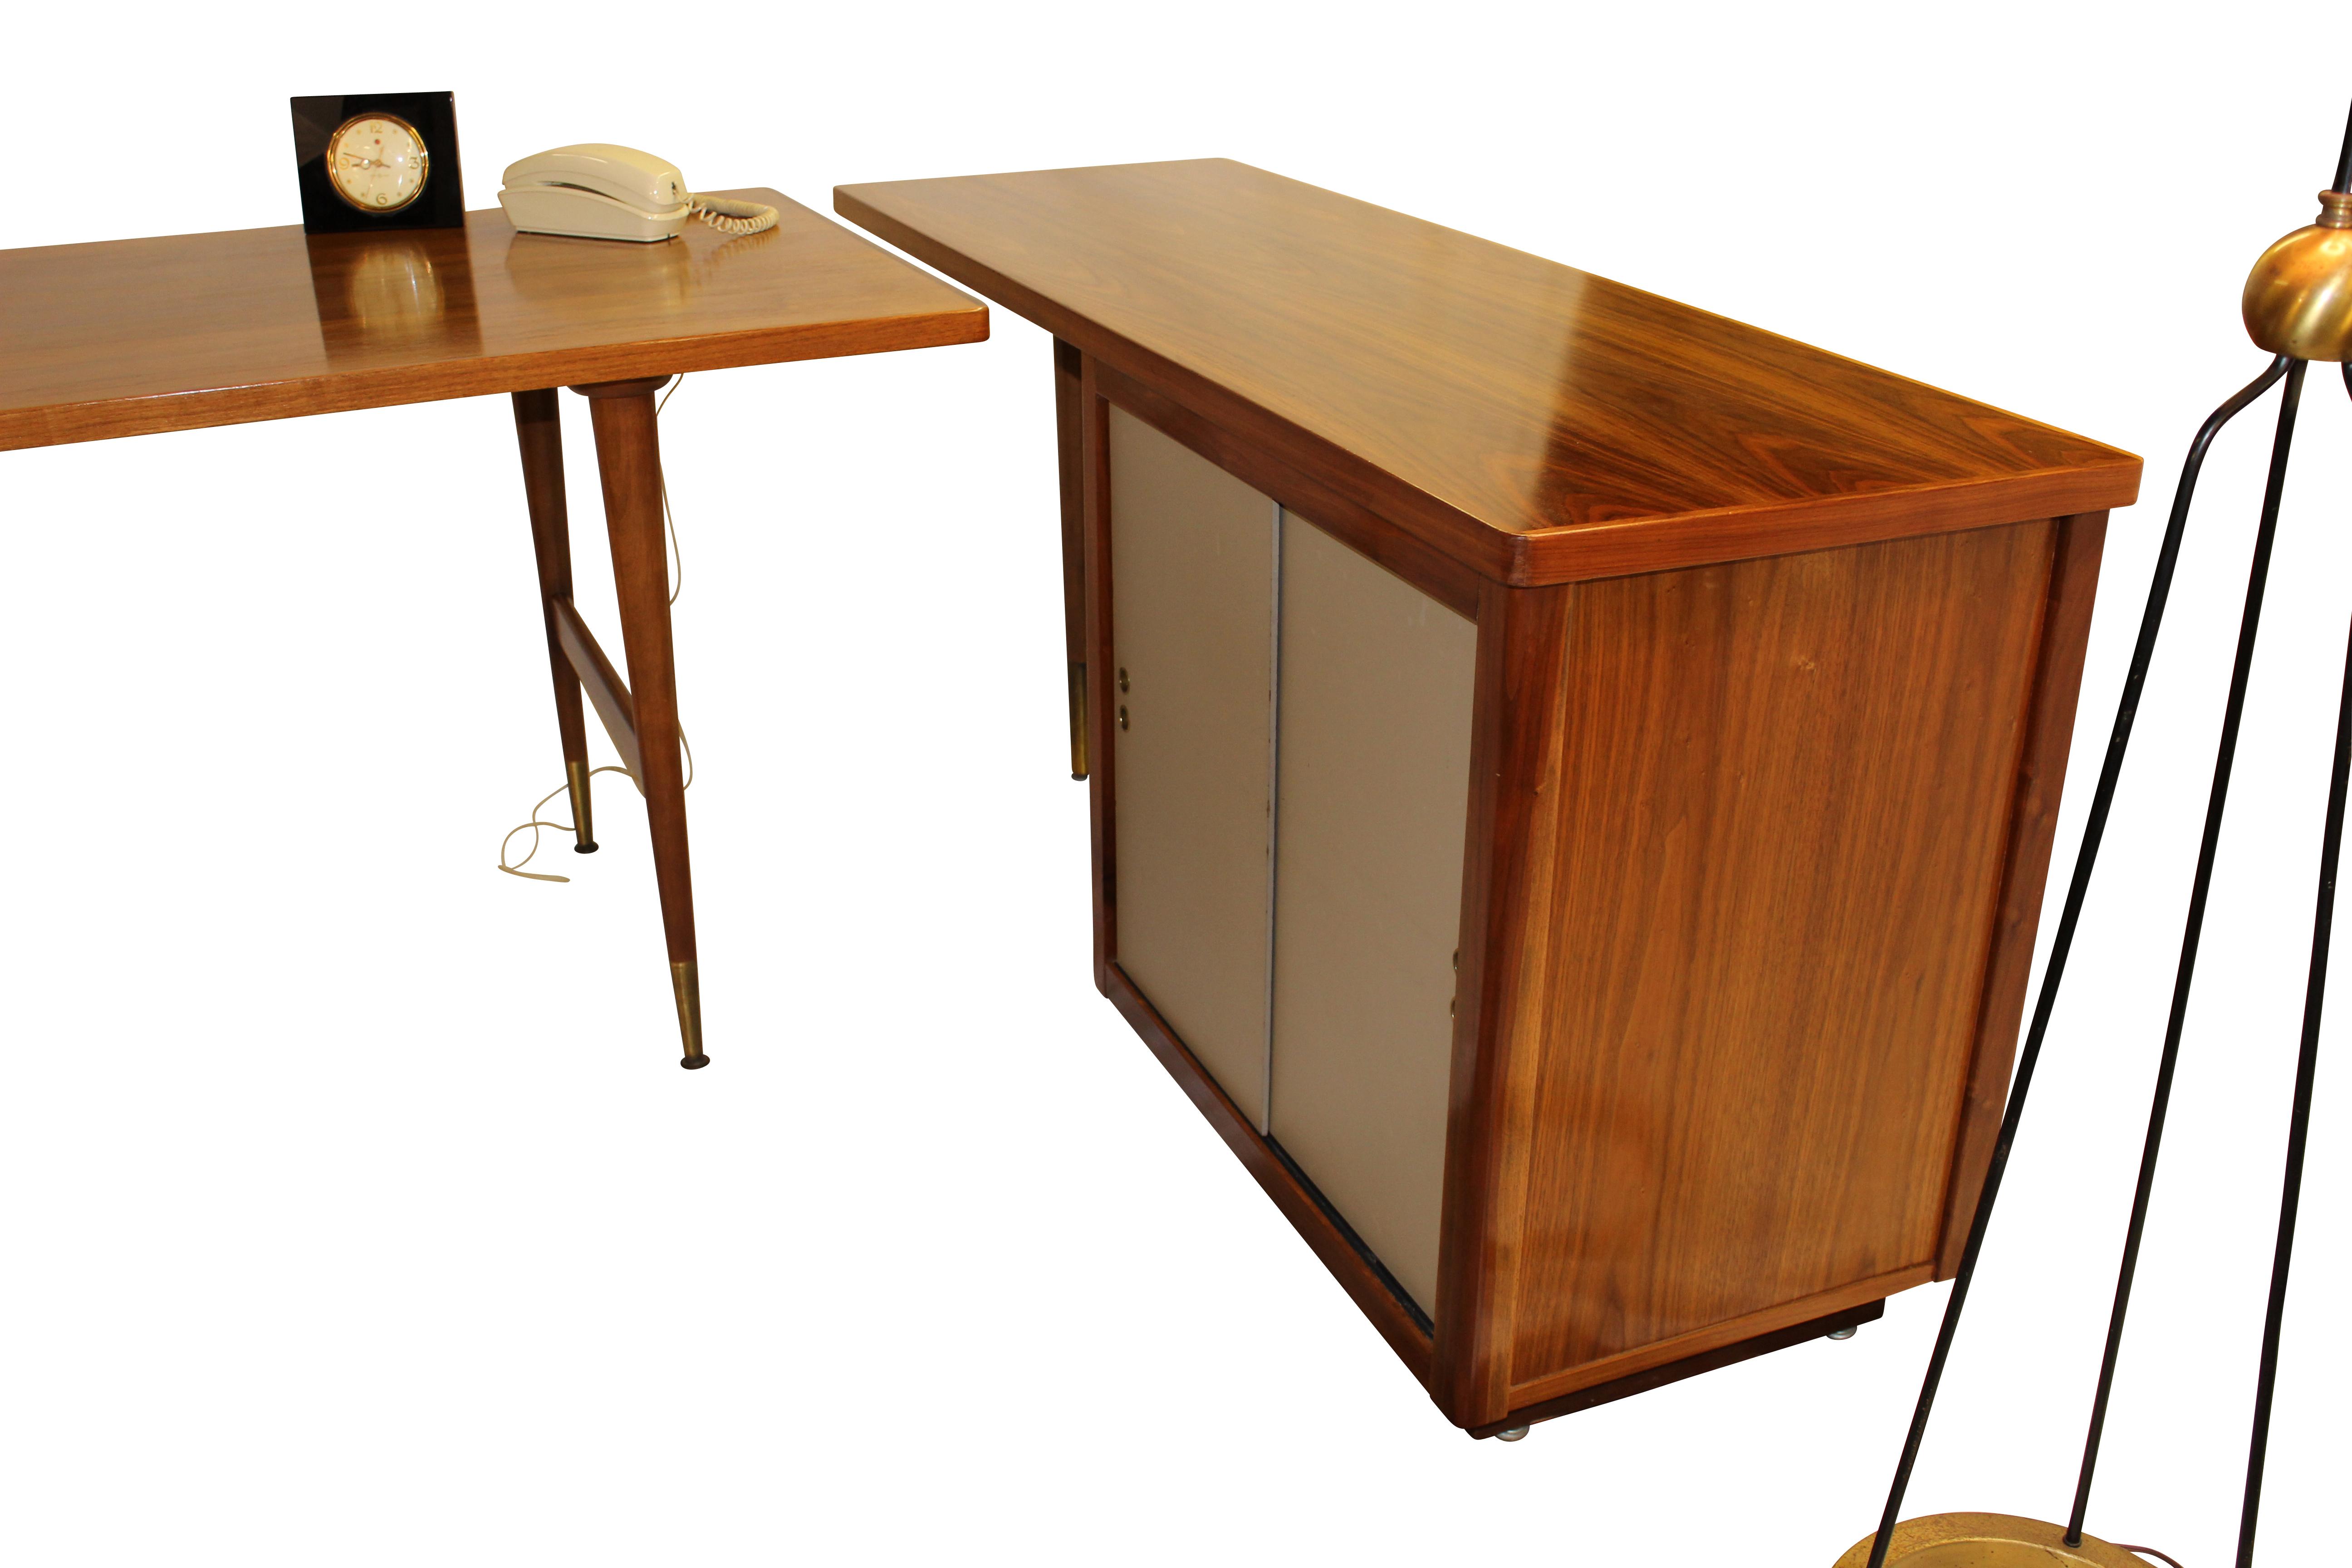 Standard Furniture Co Walnut Desk suiteGre Stuff